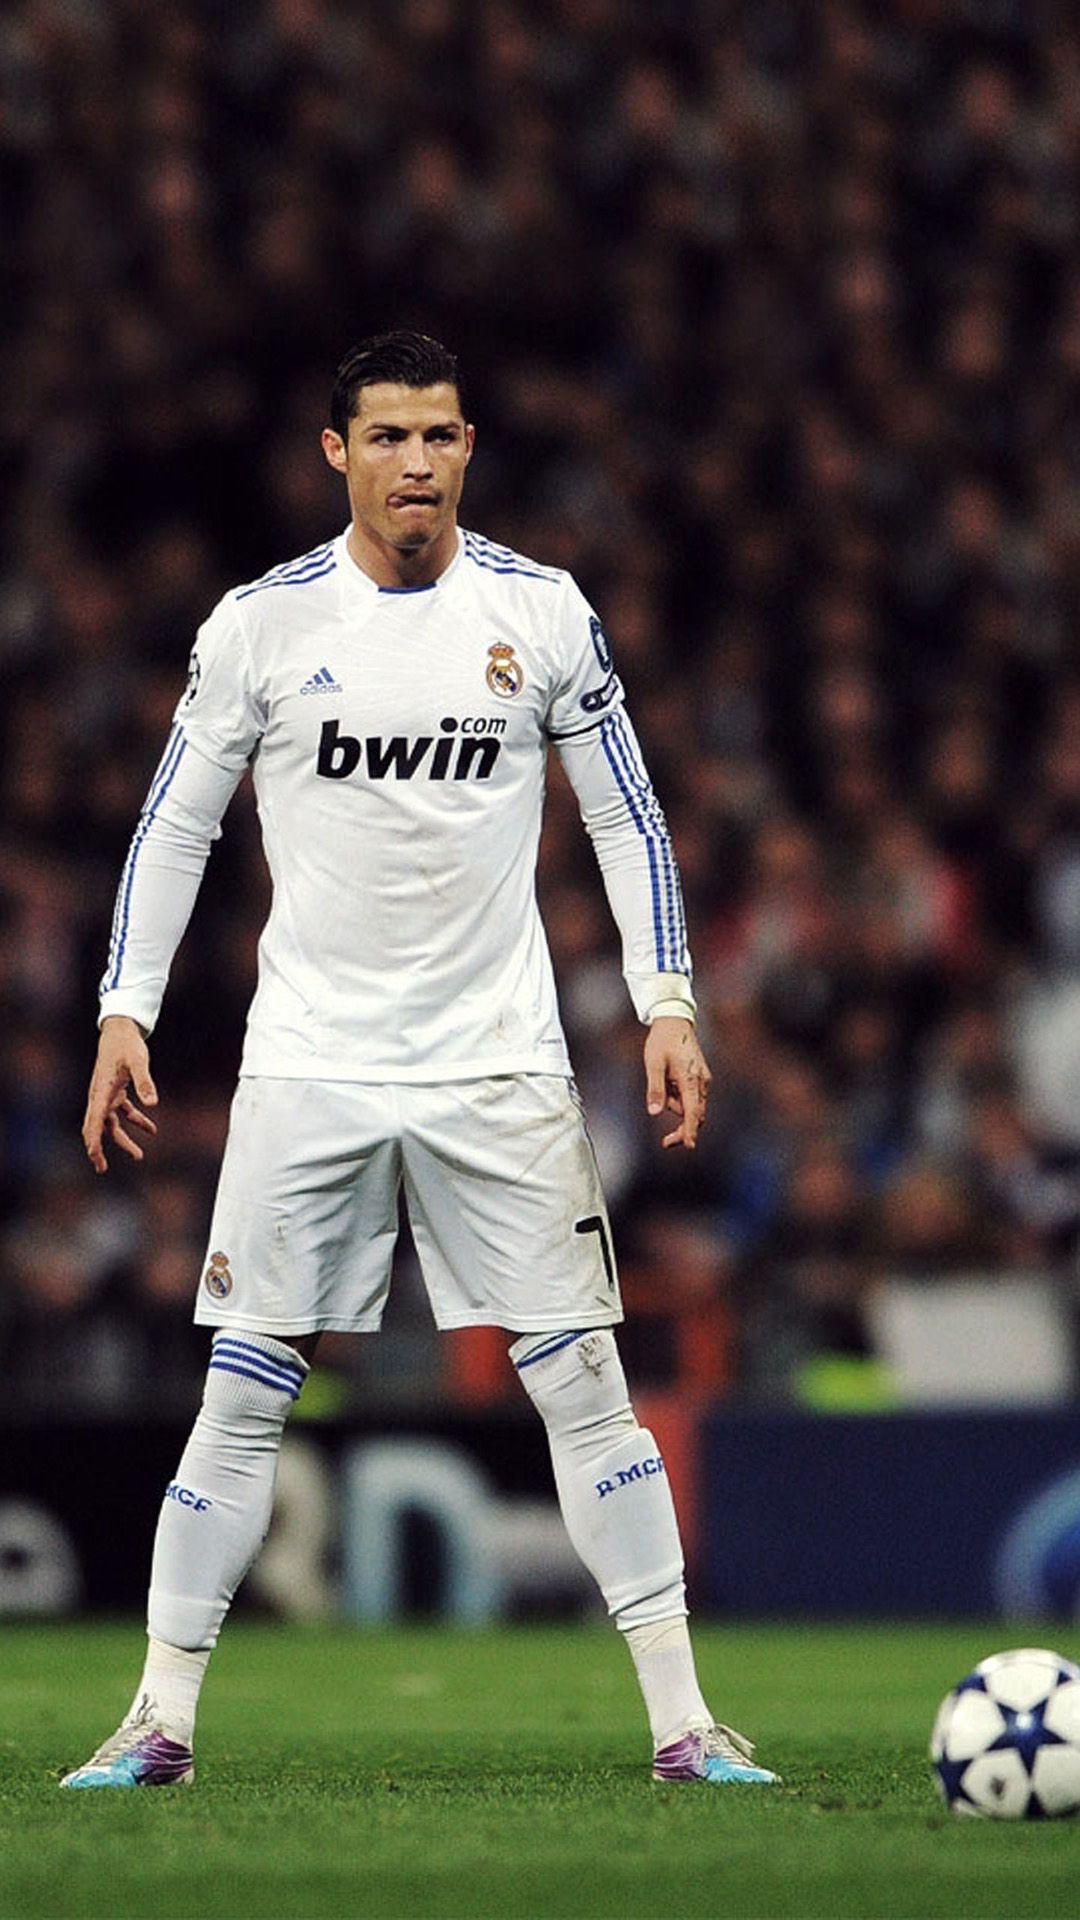 Cristiano Ronaldo Wallpapers For Iphone 7 Iphone 7 Plus Iphone 6 Ronaldo Wallpapers Cristiano Ronaldo Wallpapers Ronaldo